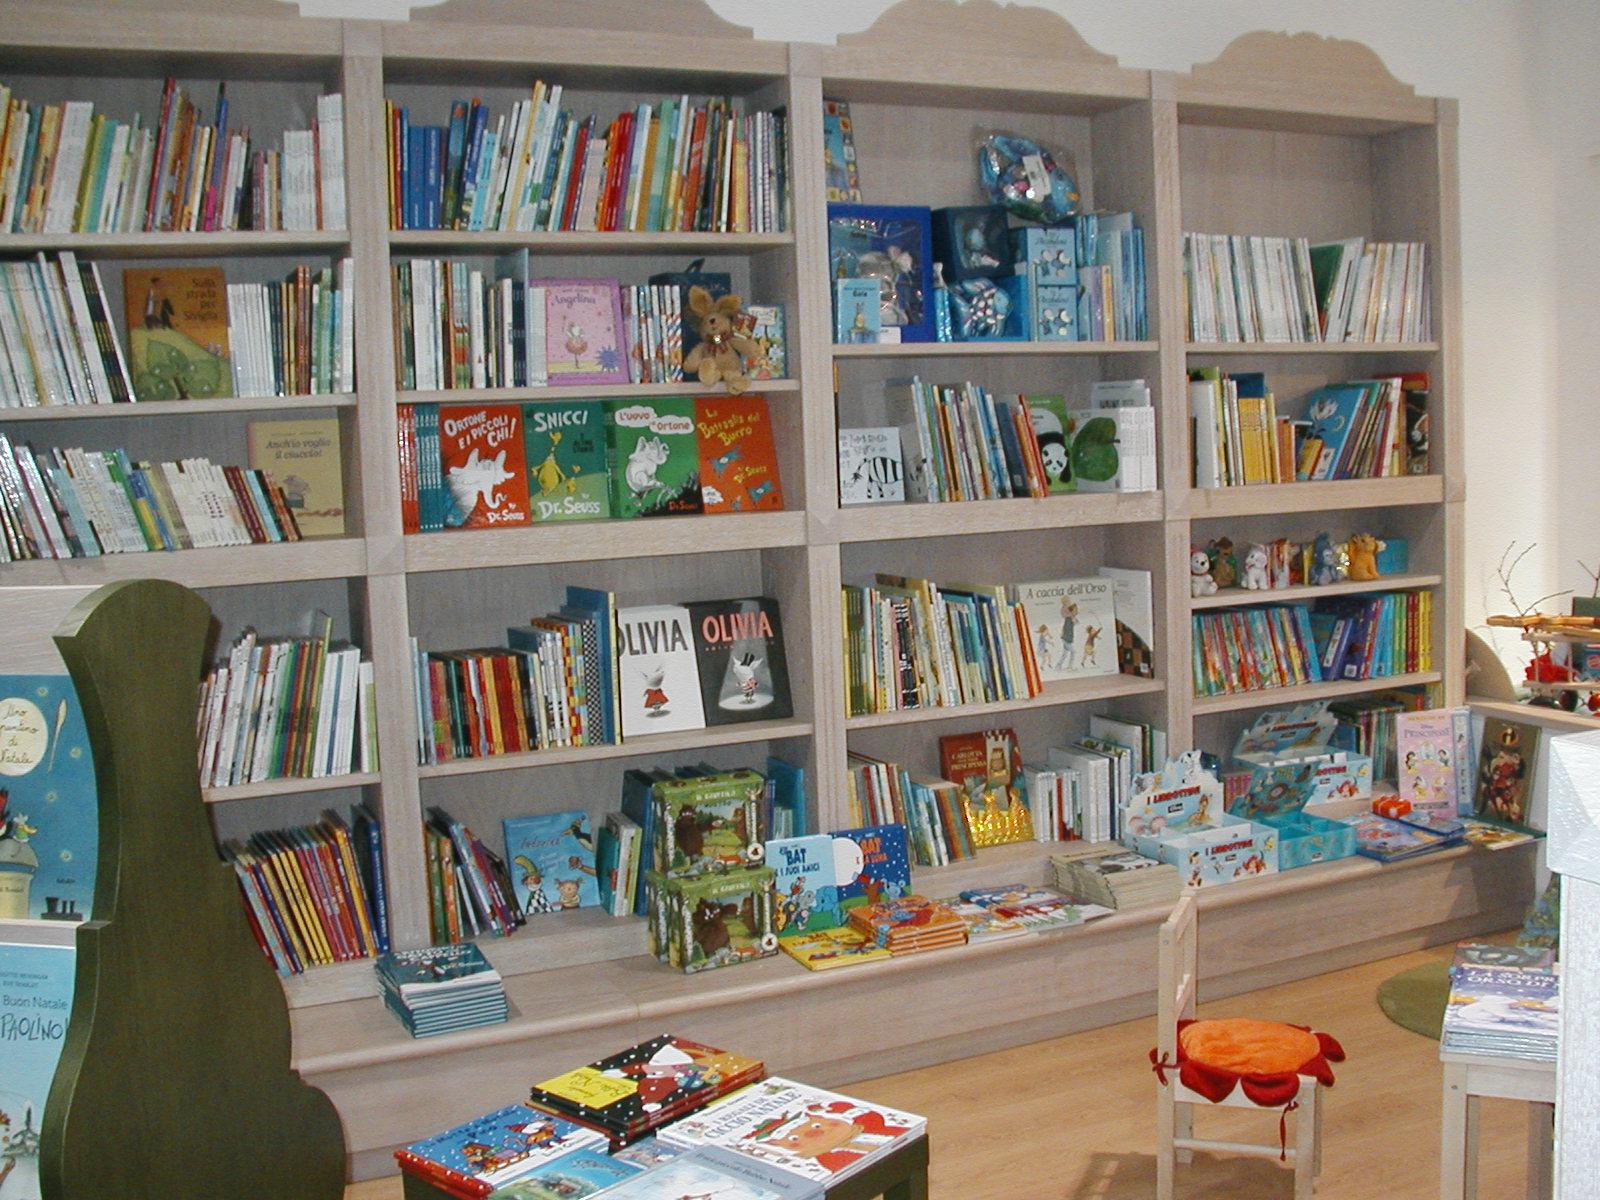 Librerie per bambini tutte le offerte cascare a fagiolo - Librerie ikea catalogo ...